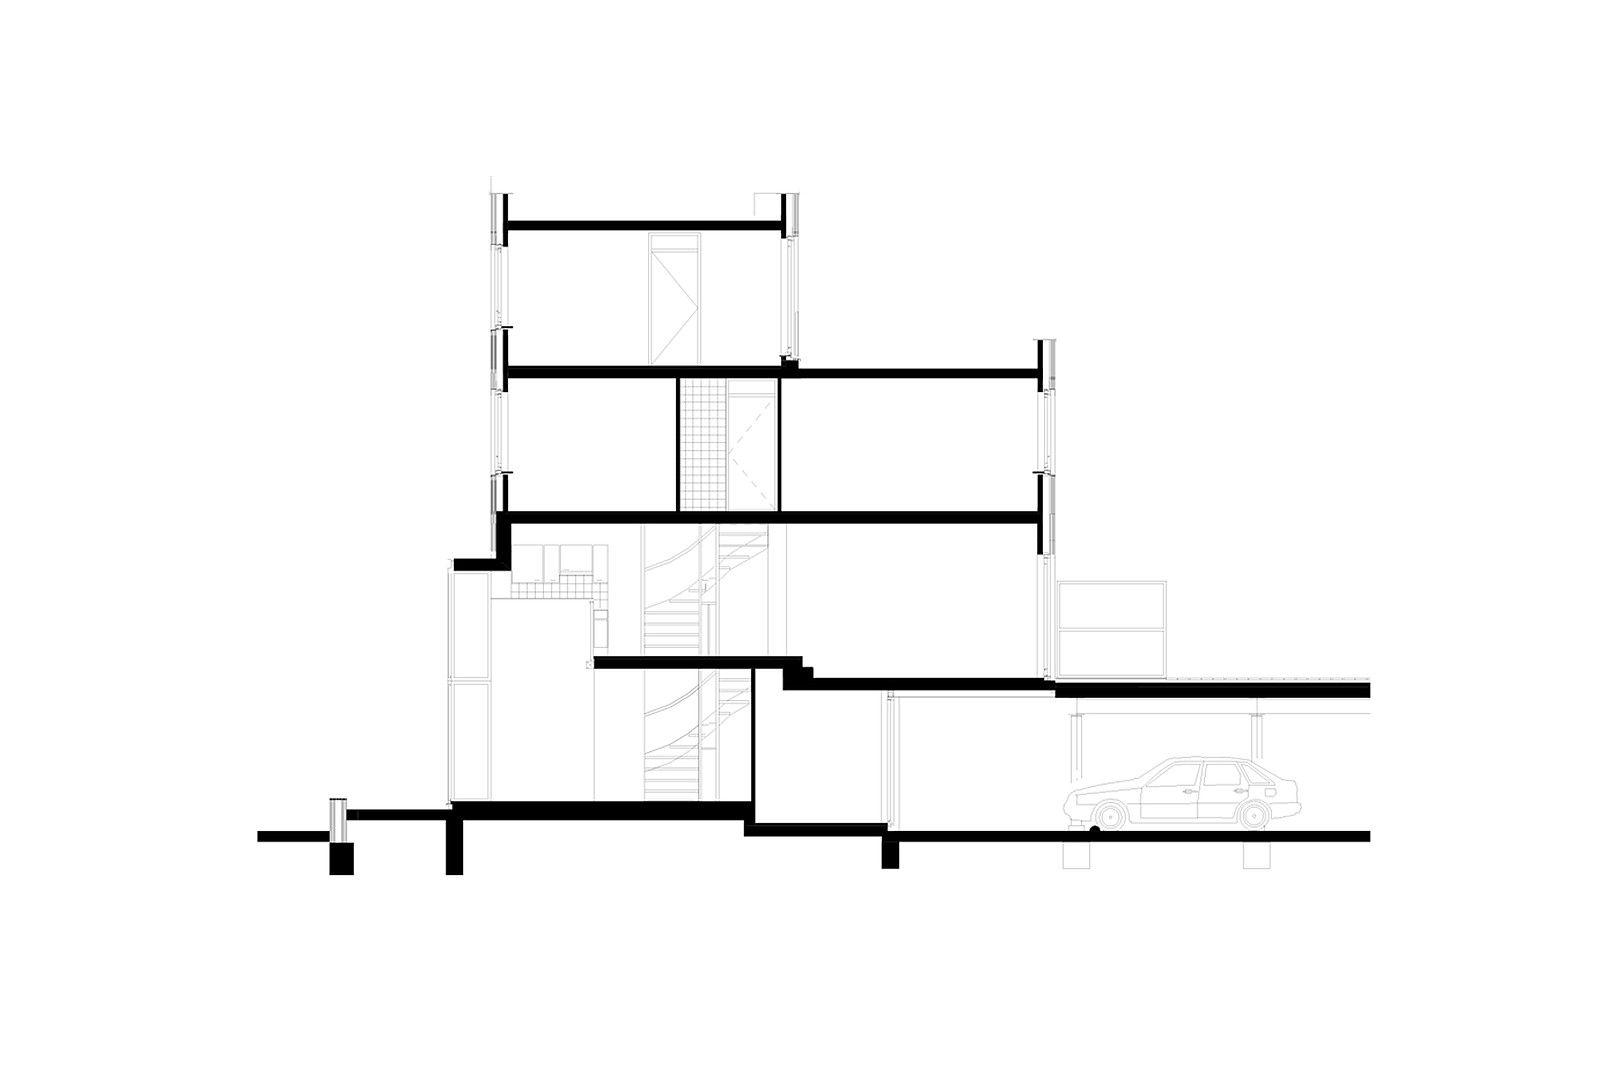 Visuals - Stadstuinen - Projects - KCAP